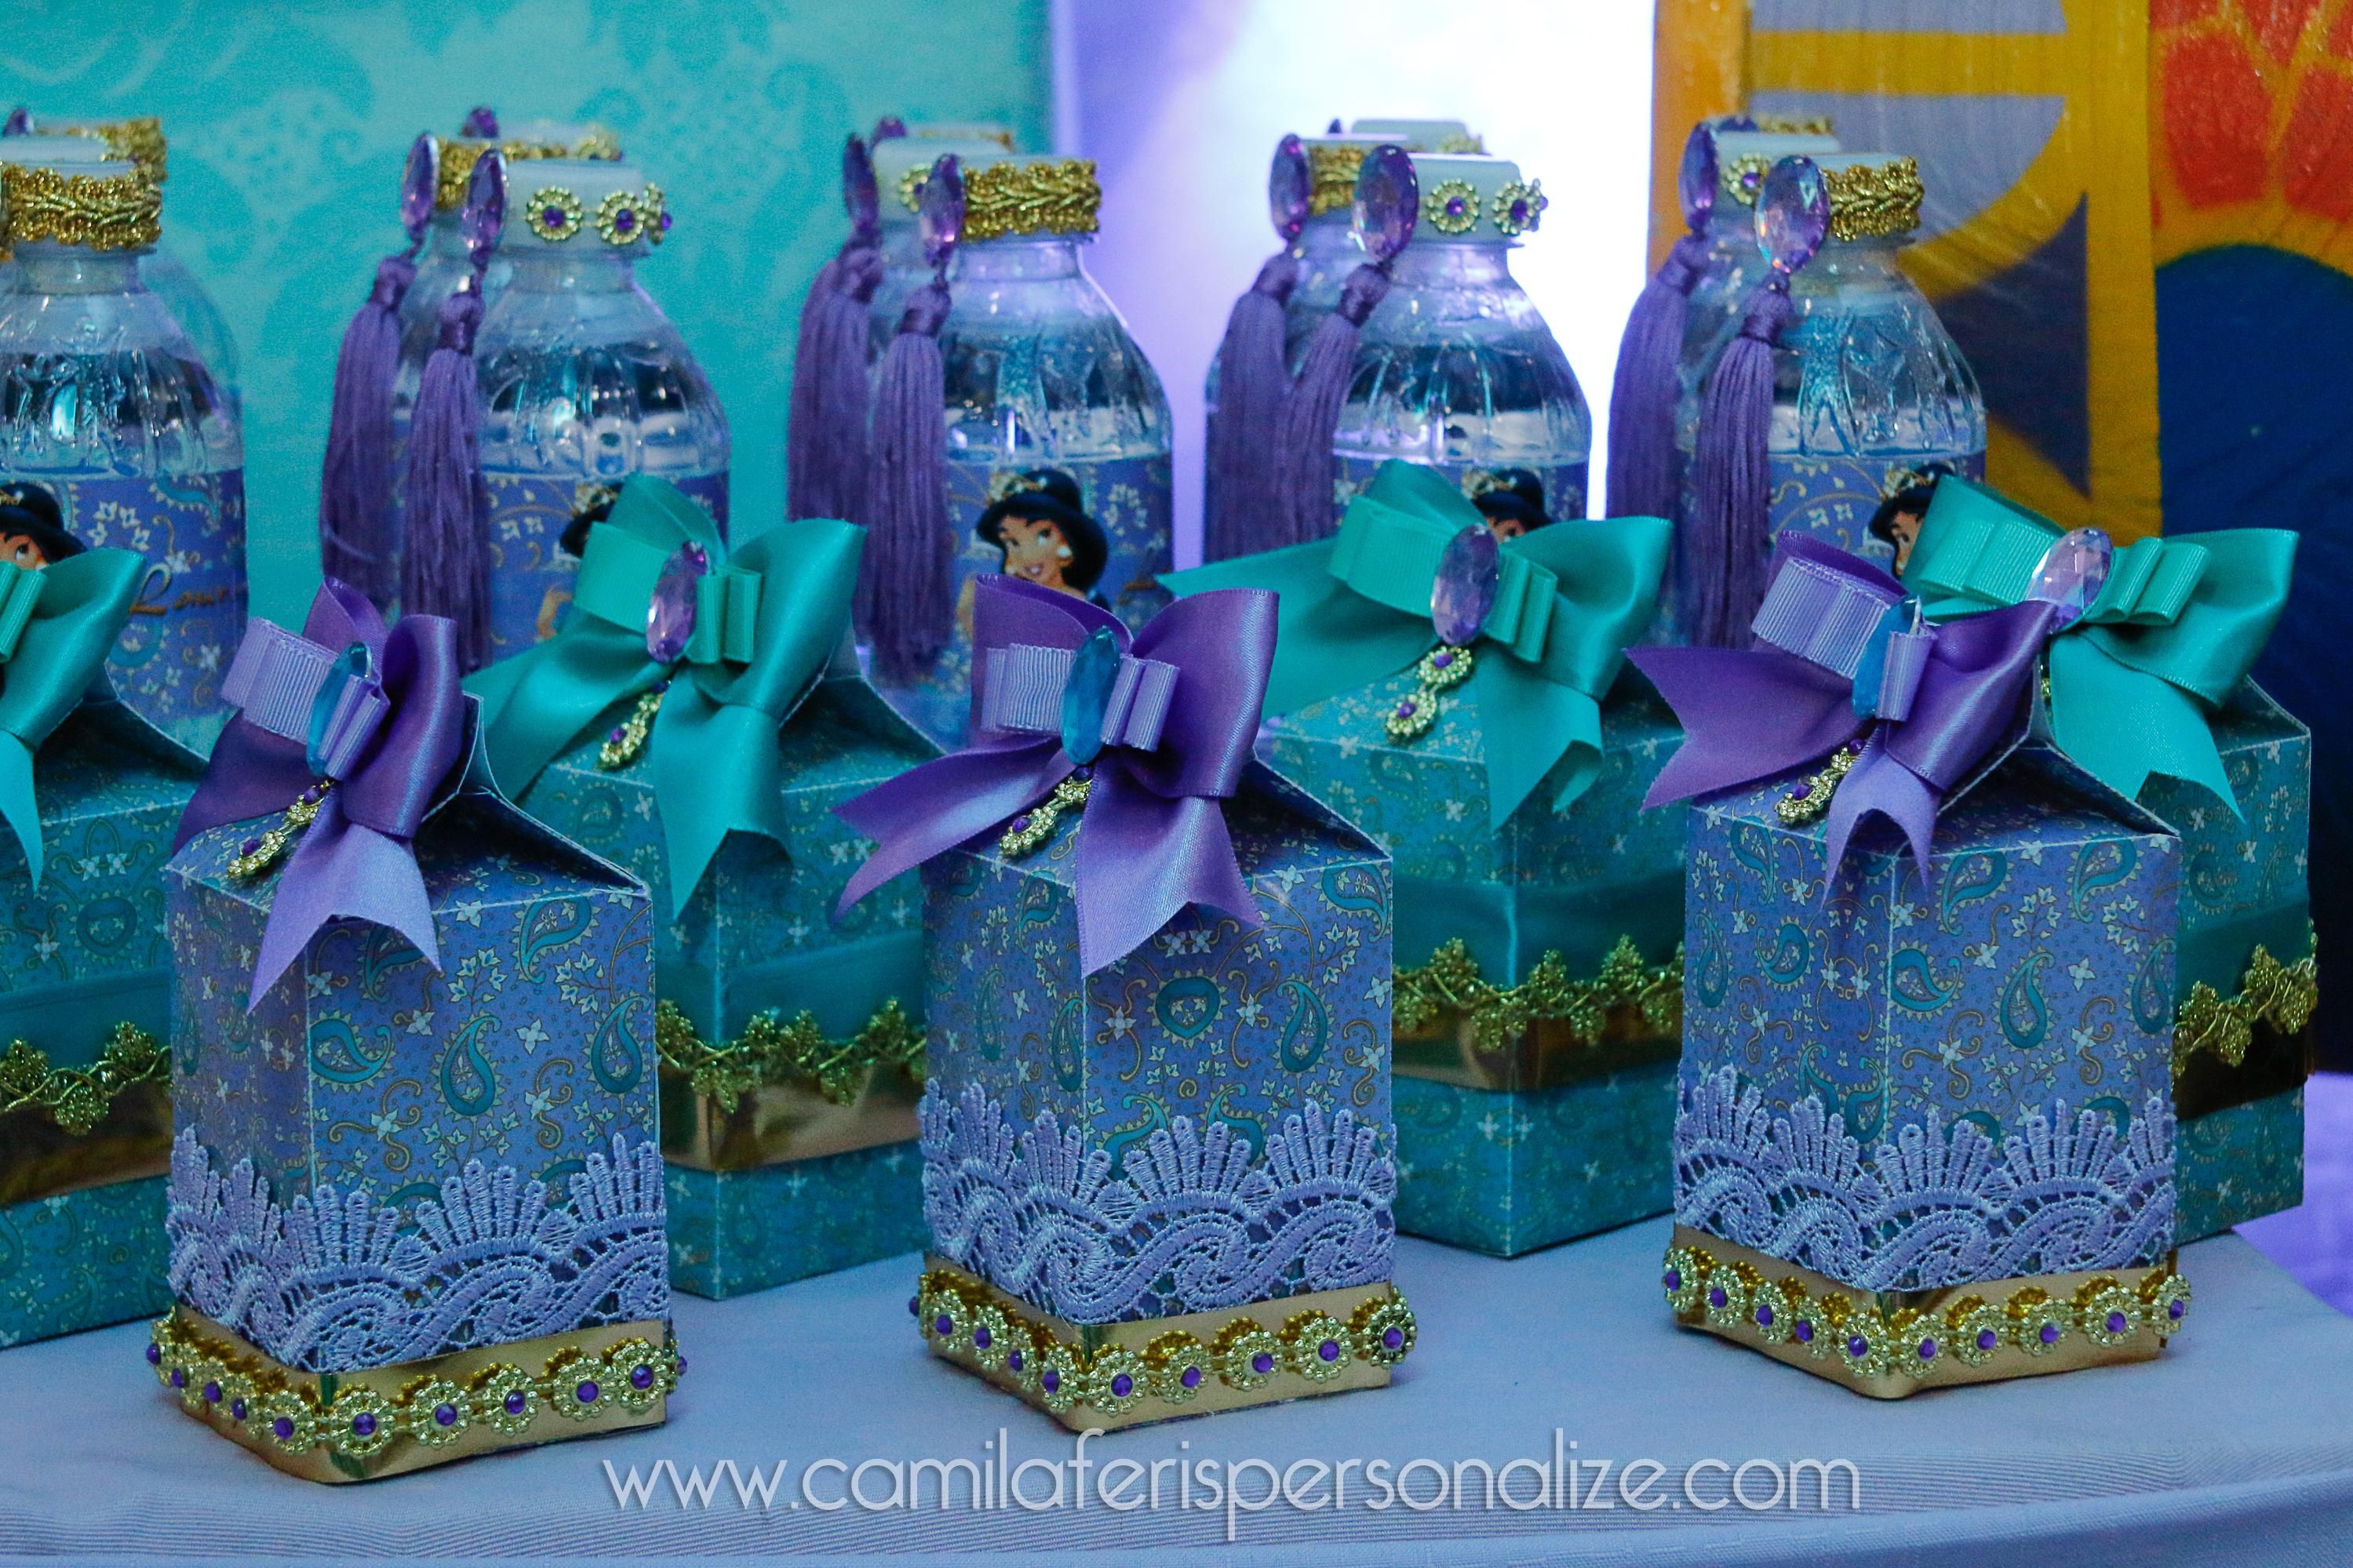 caixa milk luxo jasmine.jpg